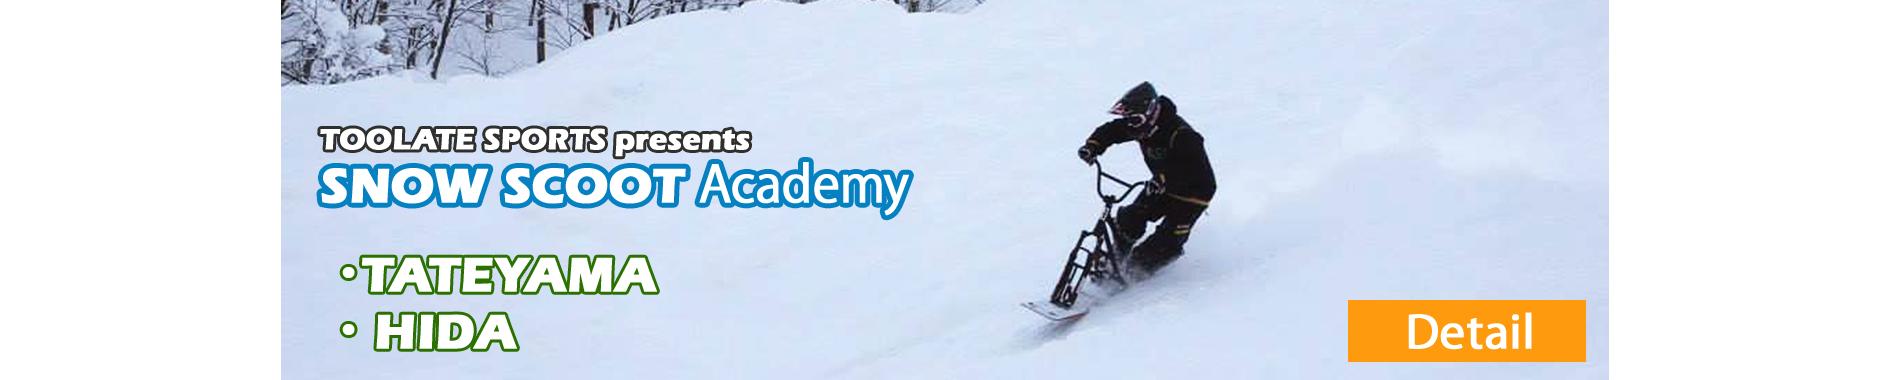 tateyama snowscootacademy